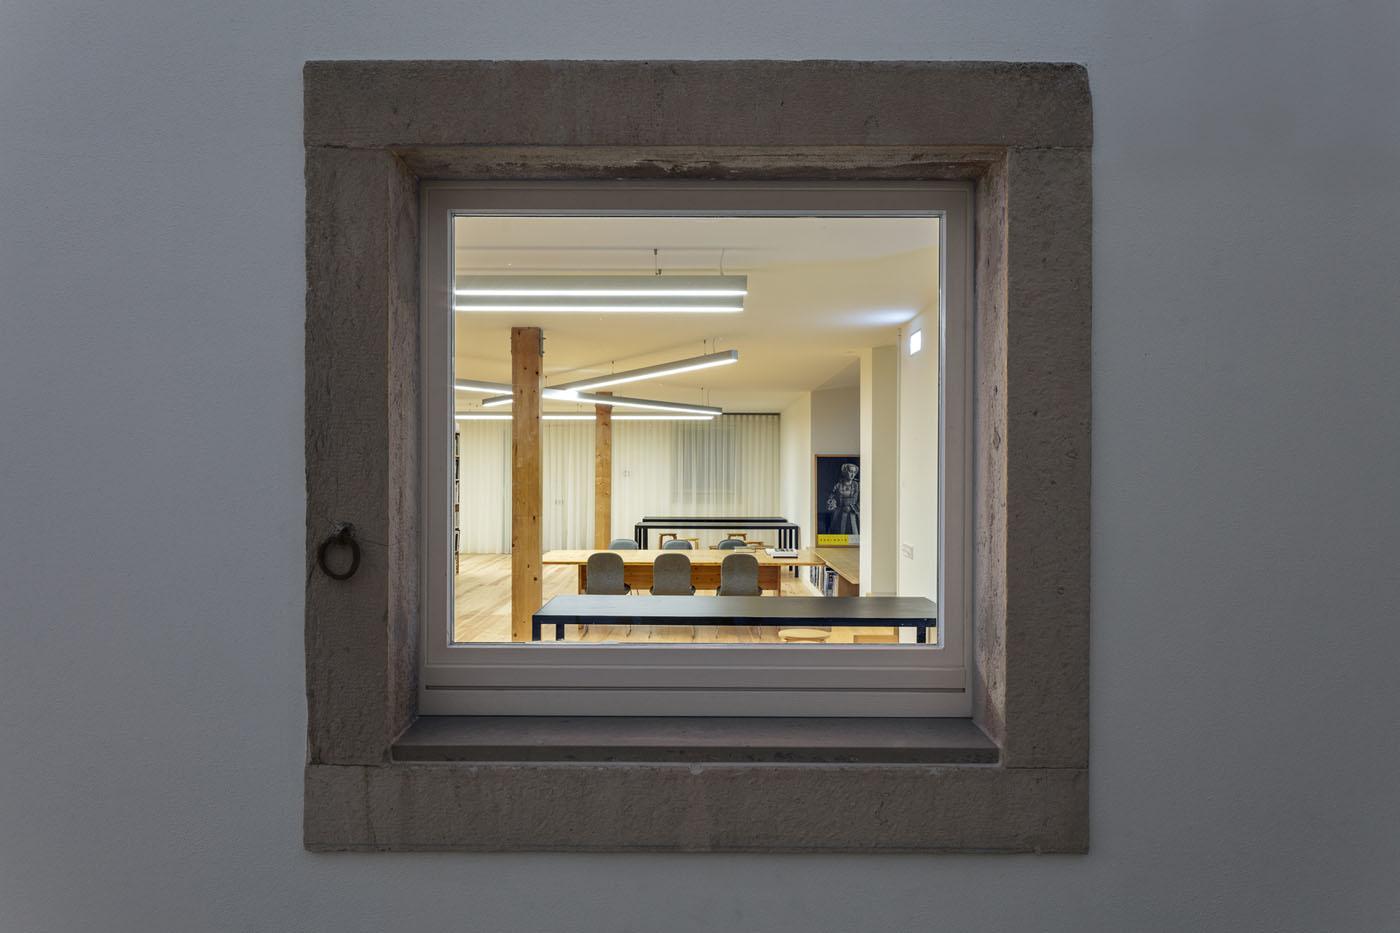 Casa Atelier by Inês Lobo Arquitectos - Architectureaward Bigmat 2021 Edition